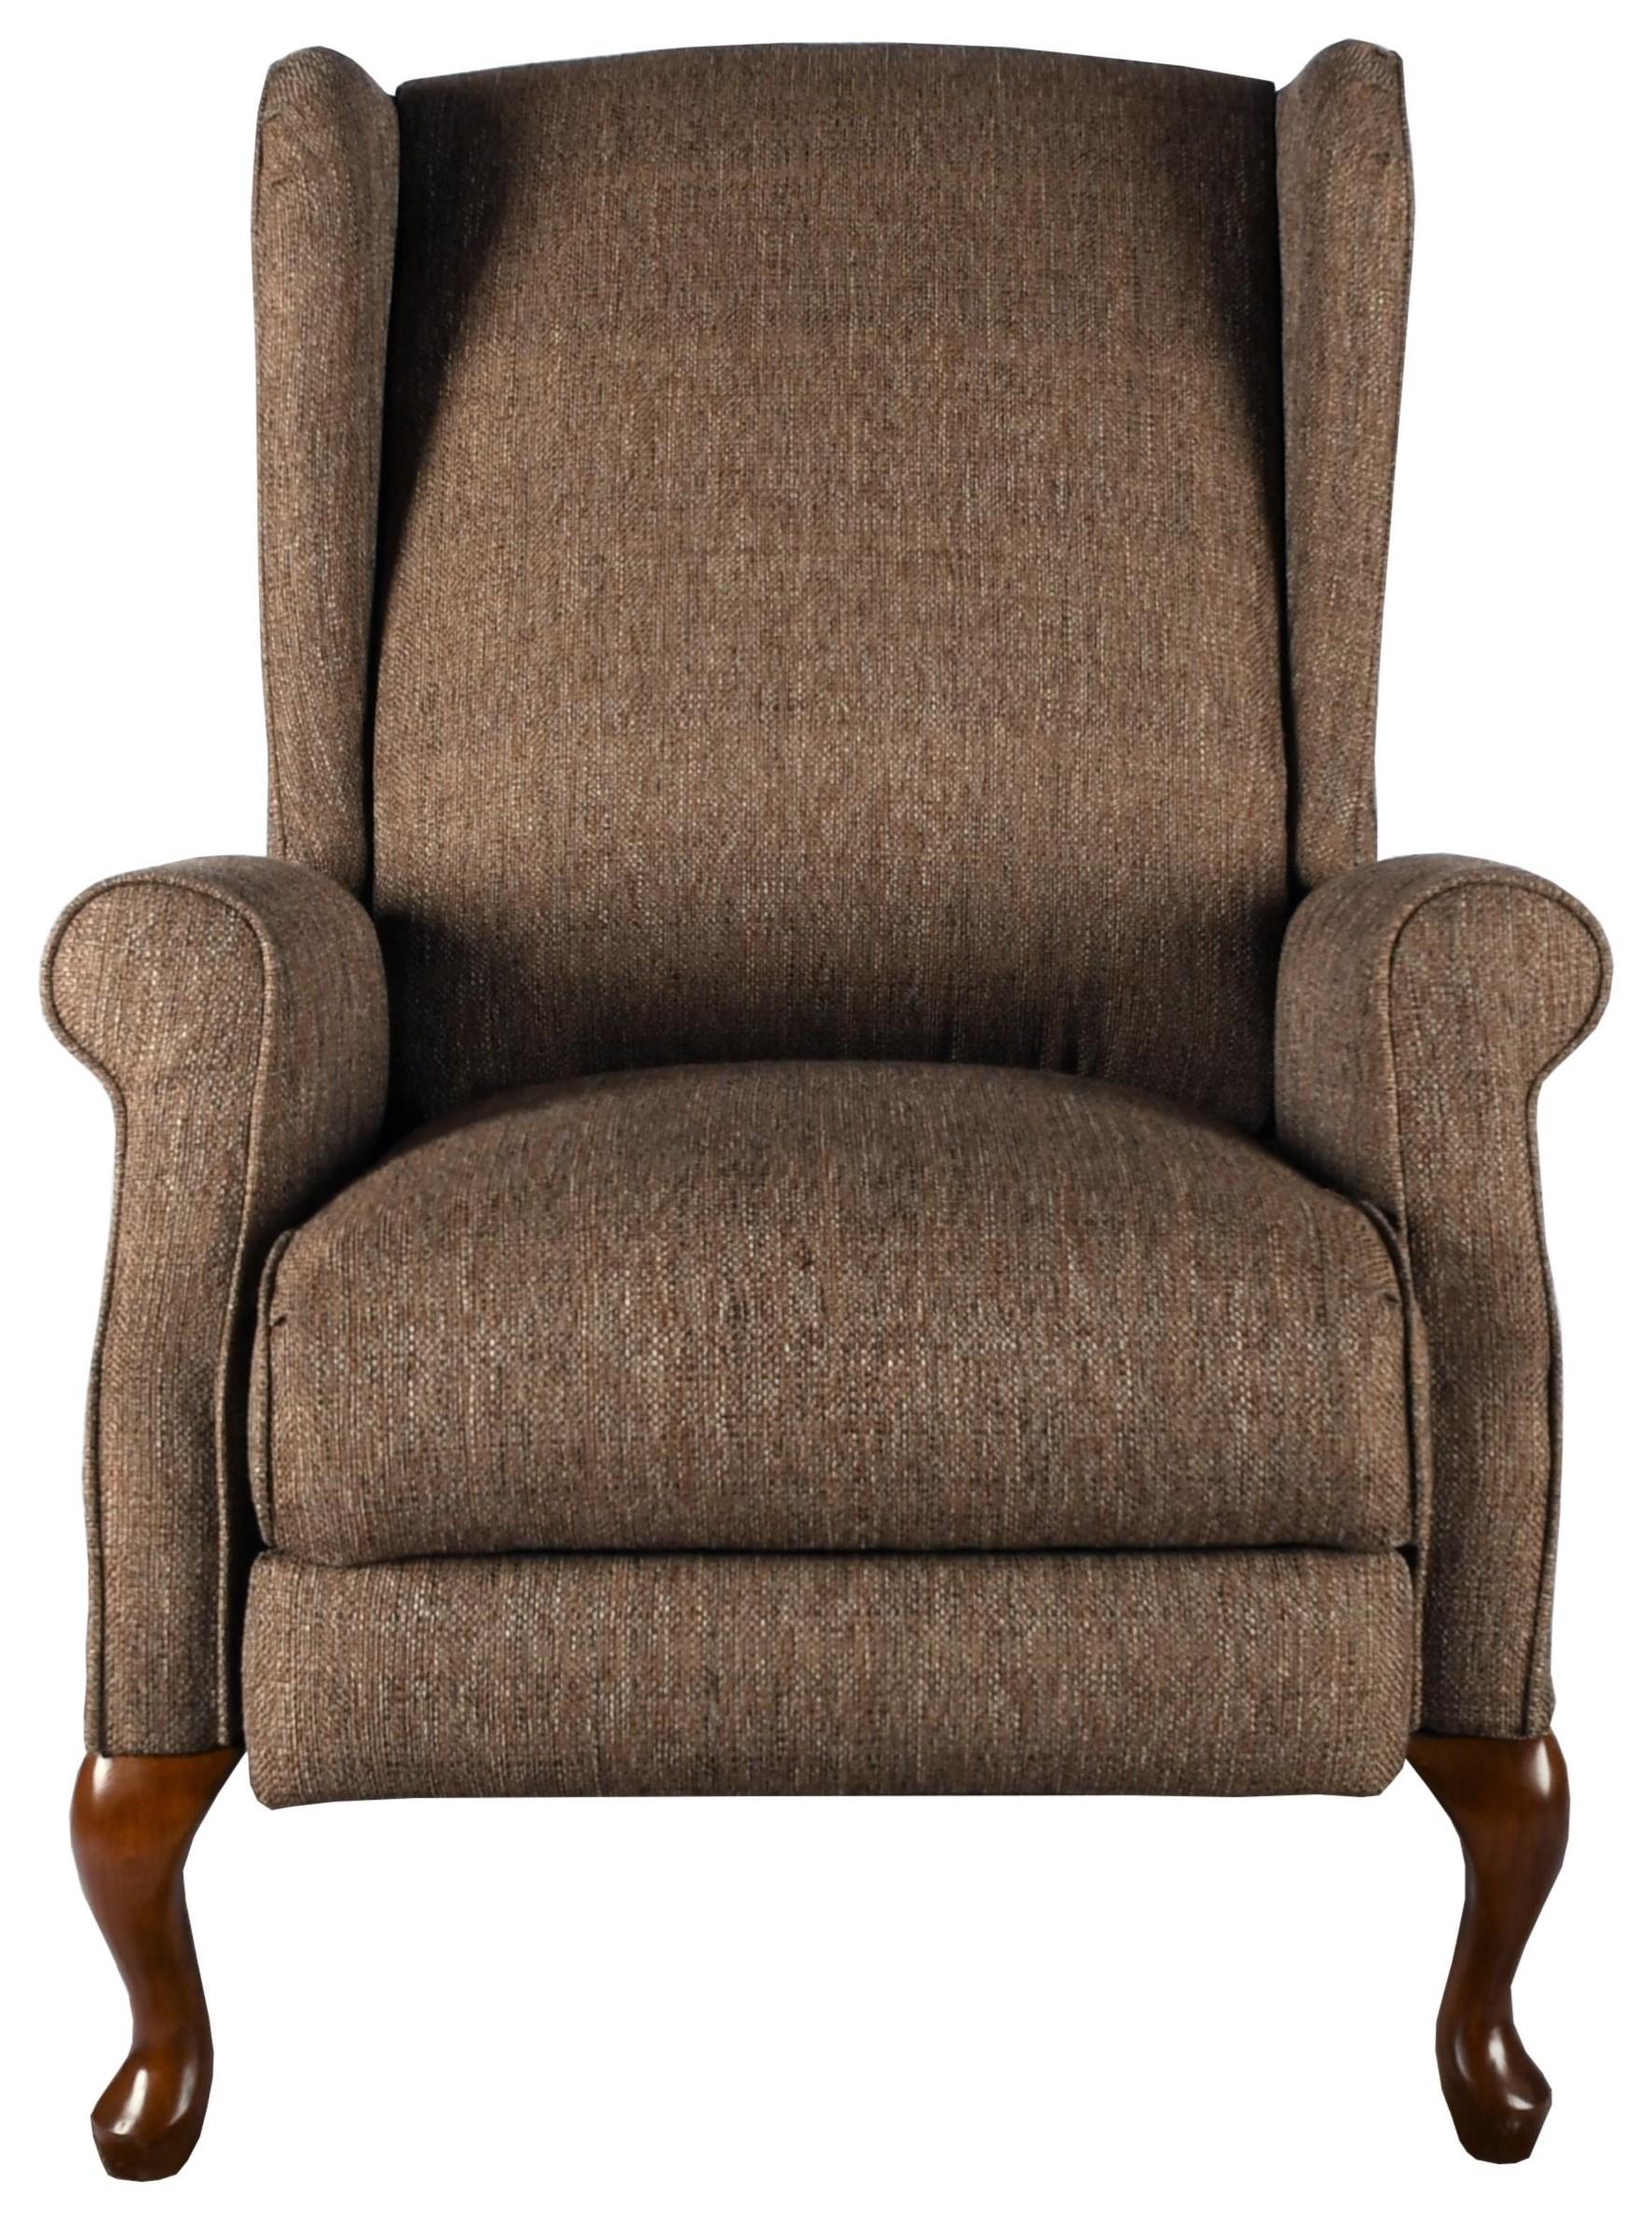 Kimberly High Leg Recliner by La-Z-Boy at Bennett's Furniture and Mattresses